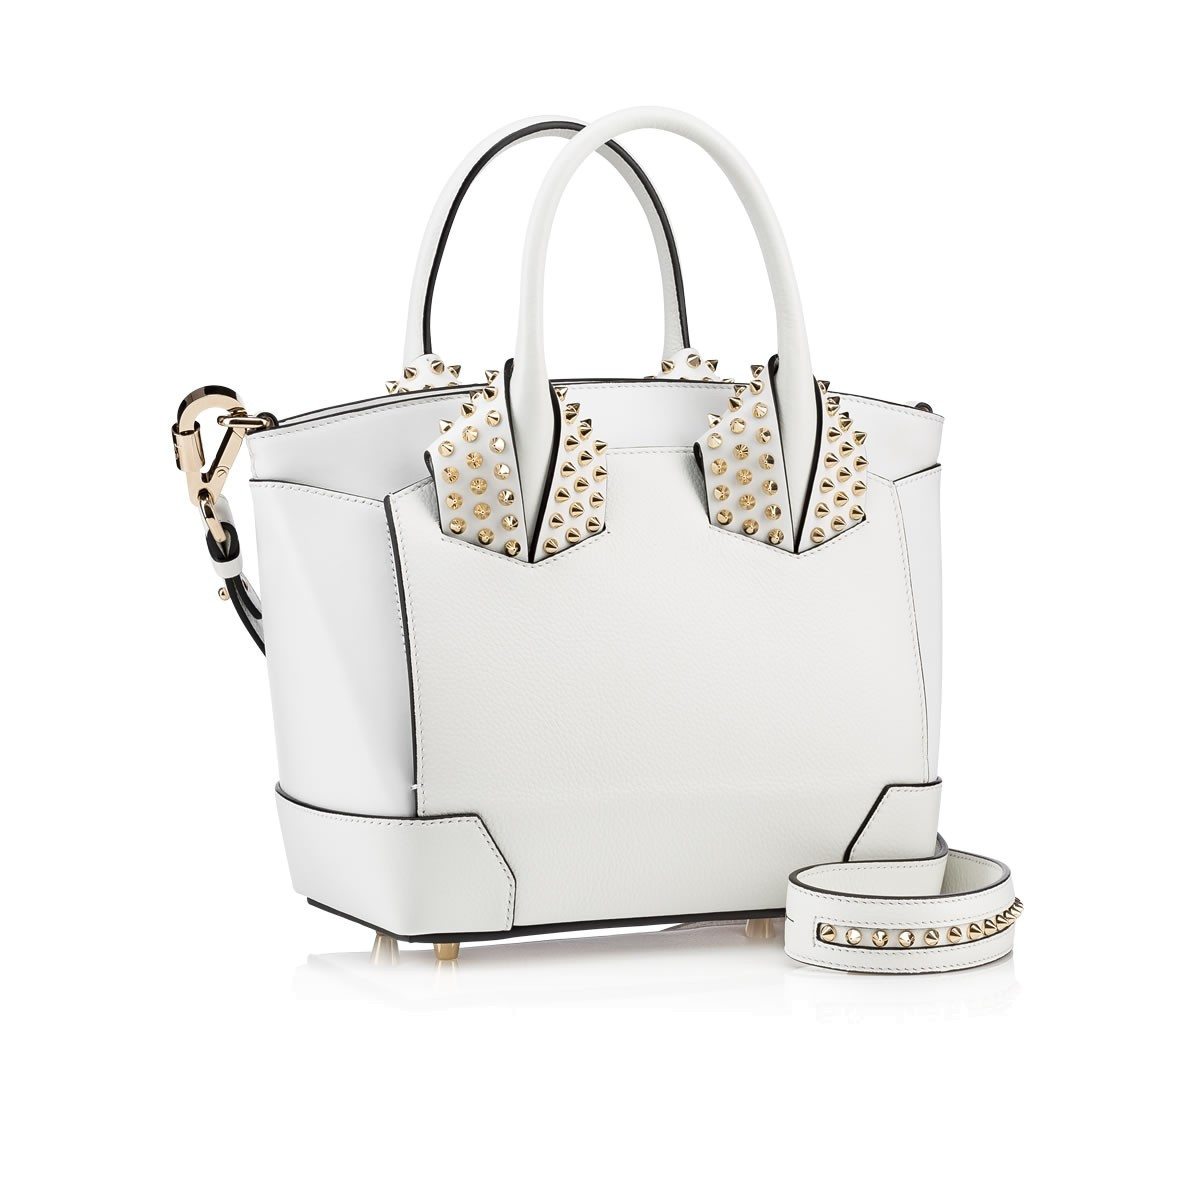 El nuevo 'it bag' de Christian Louboutin se llama 'Eloise'